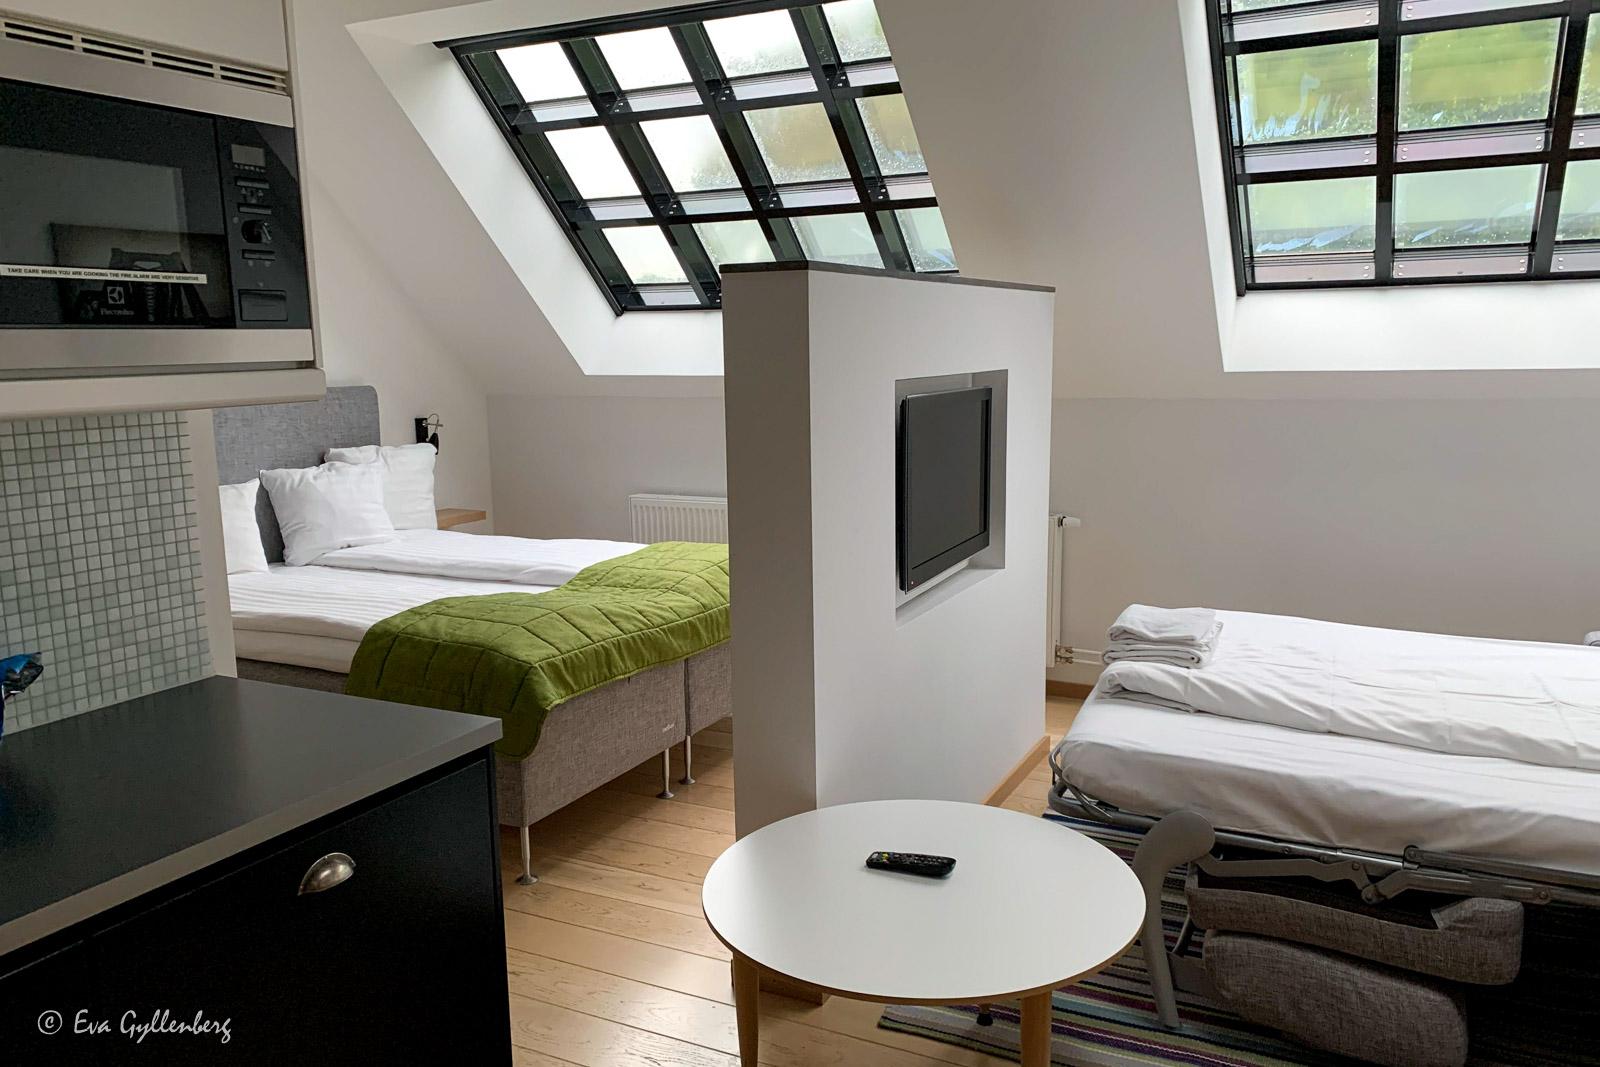 The More Hotel - Snyggt lägenhetshotell i Lund 10